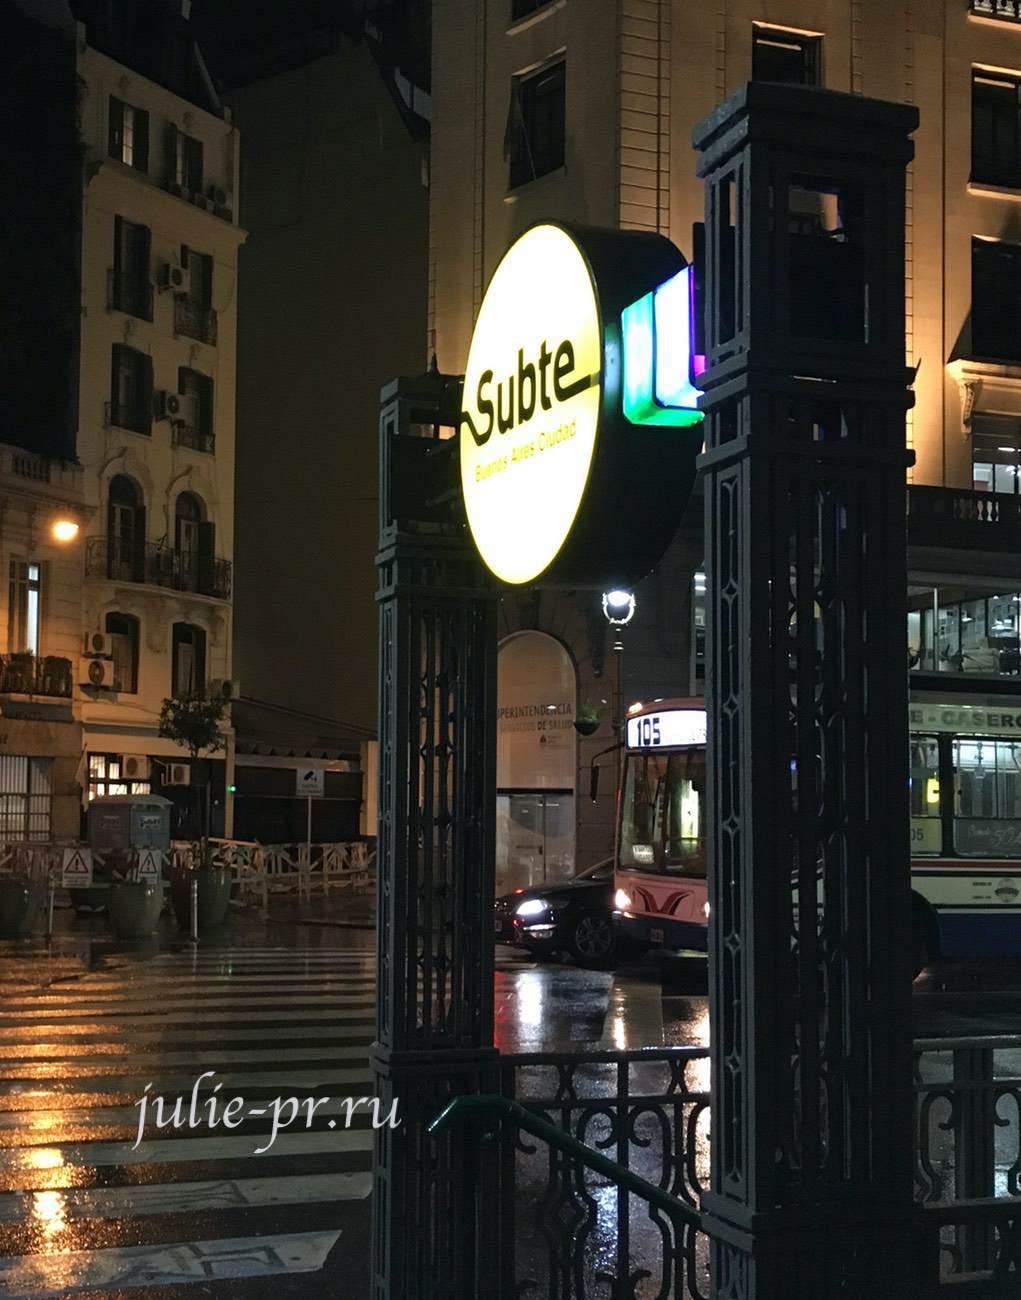 Аргентина, Буэнос-Айрес, вечер, метро Subte